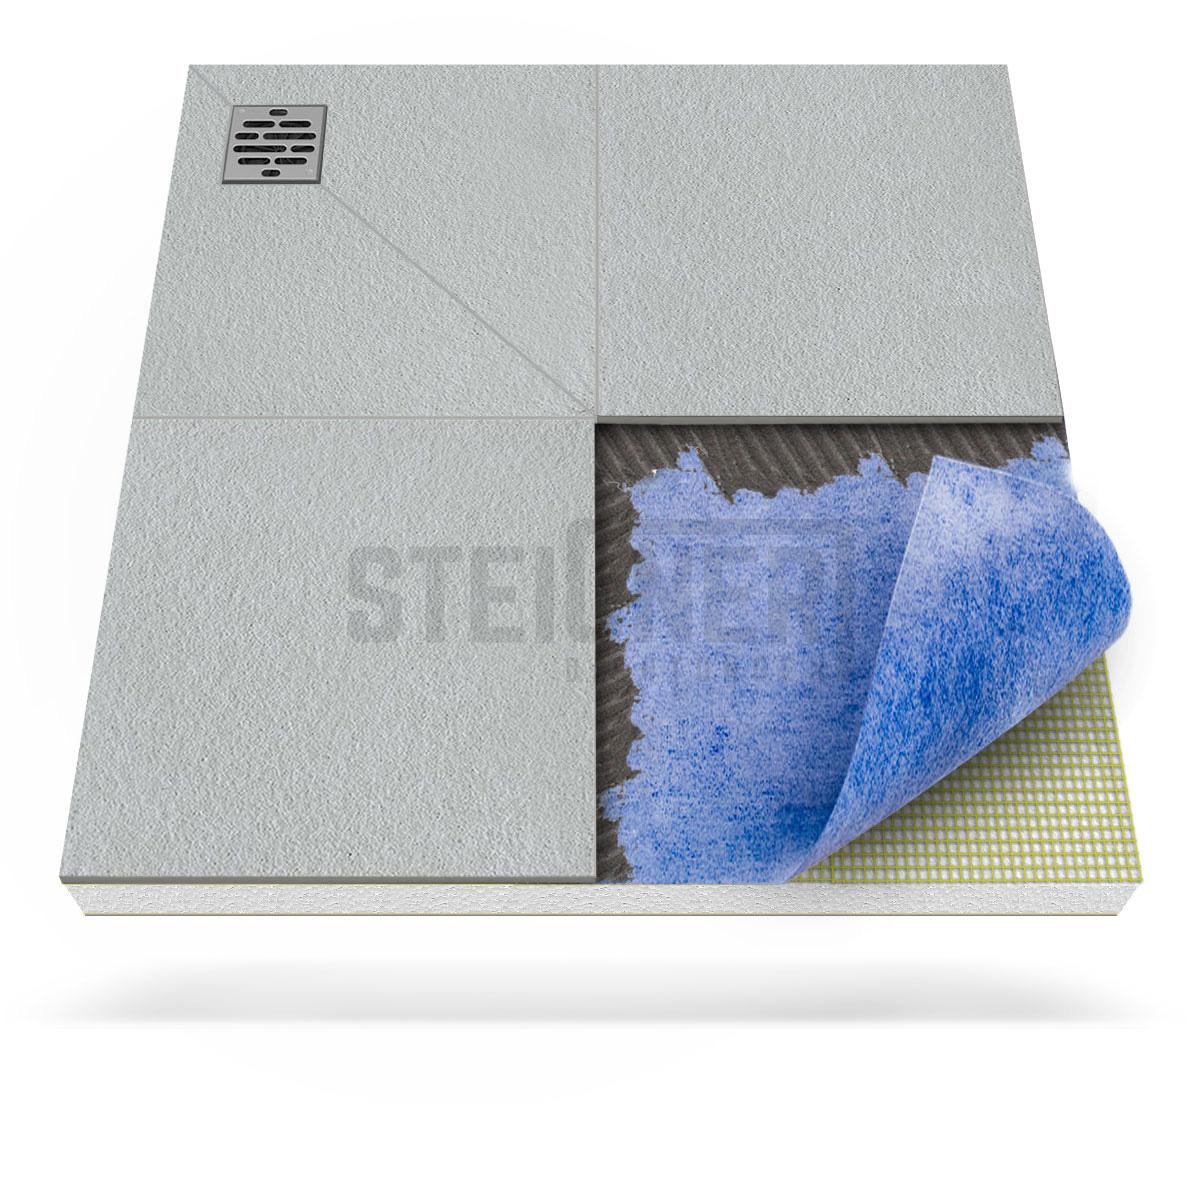 Duschboard Selber Bauen duschkabine duschelement ablauf dezentral duschboard befliesbar